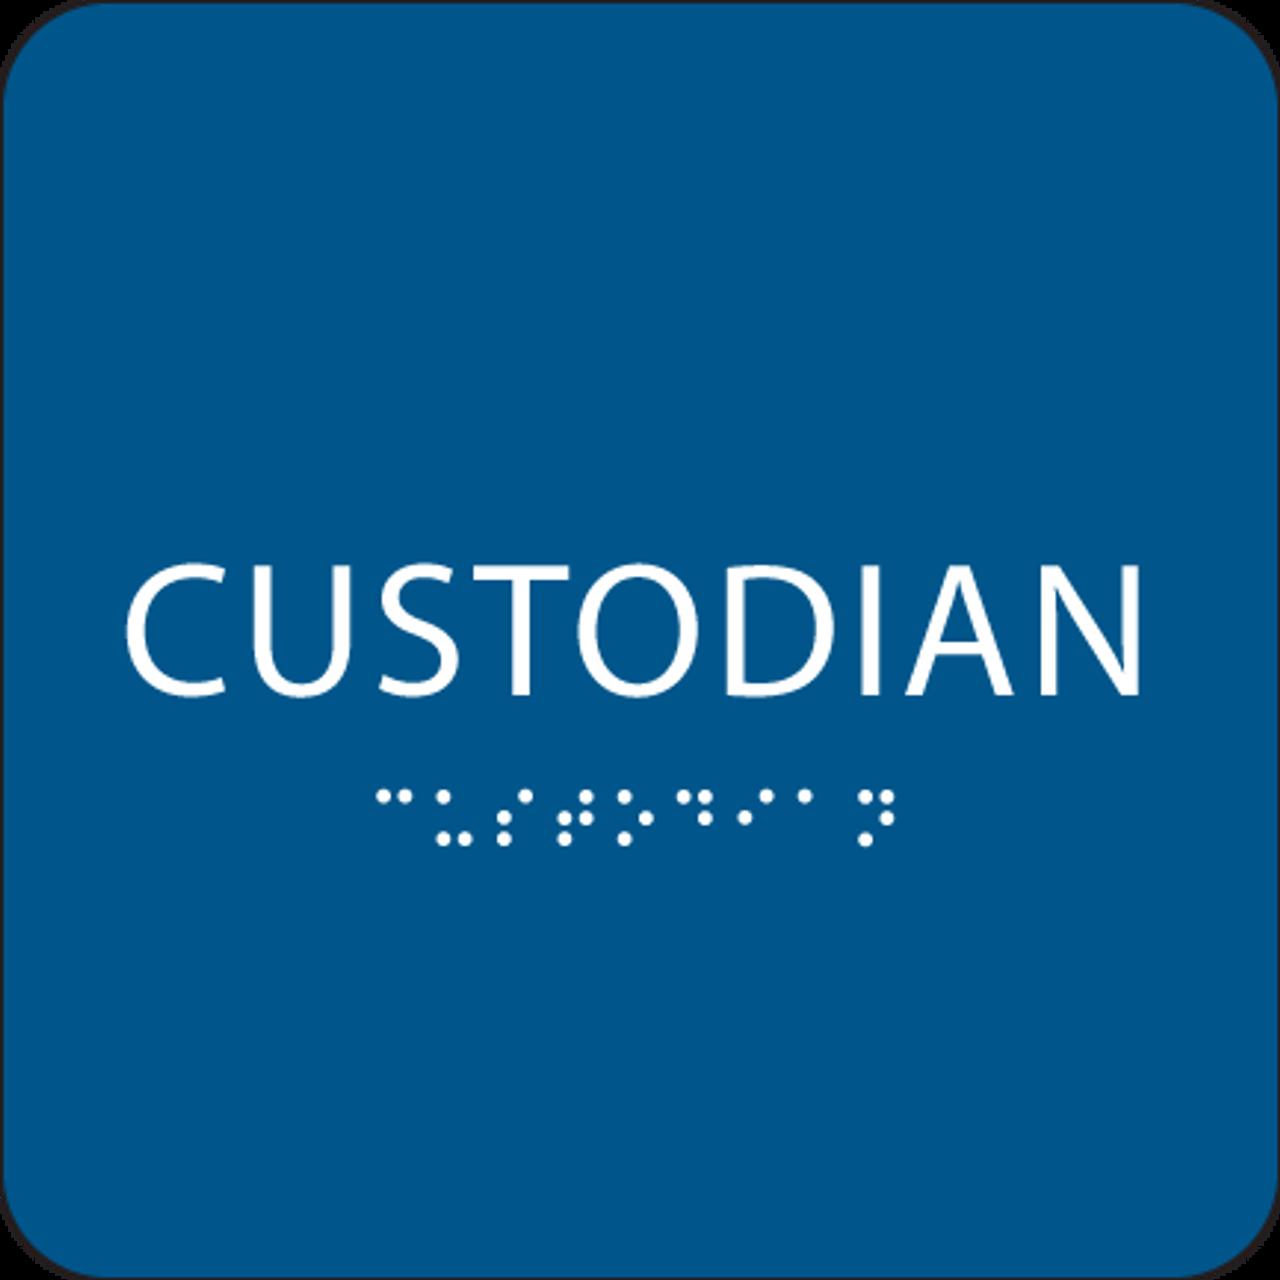 Royal Custodian ADA Sign